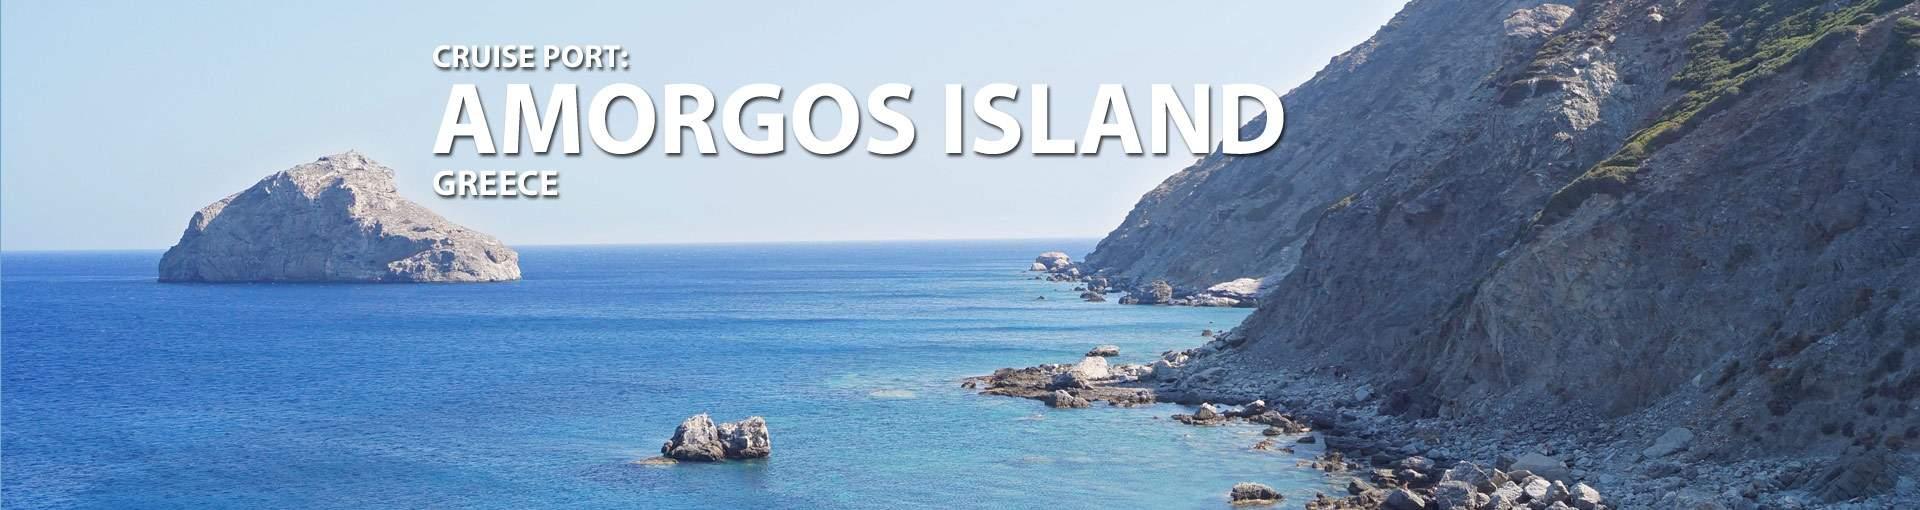 Amorgos Island, Greece Cruise Port